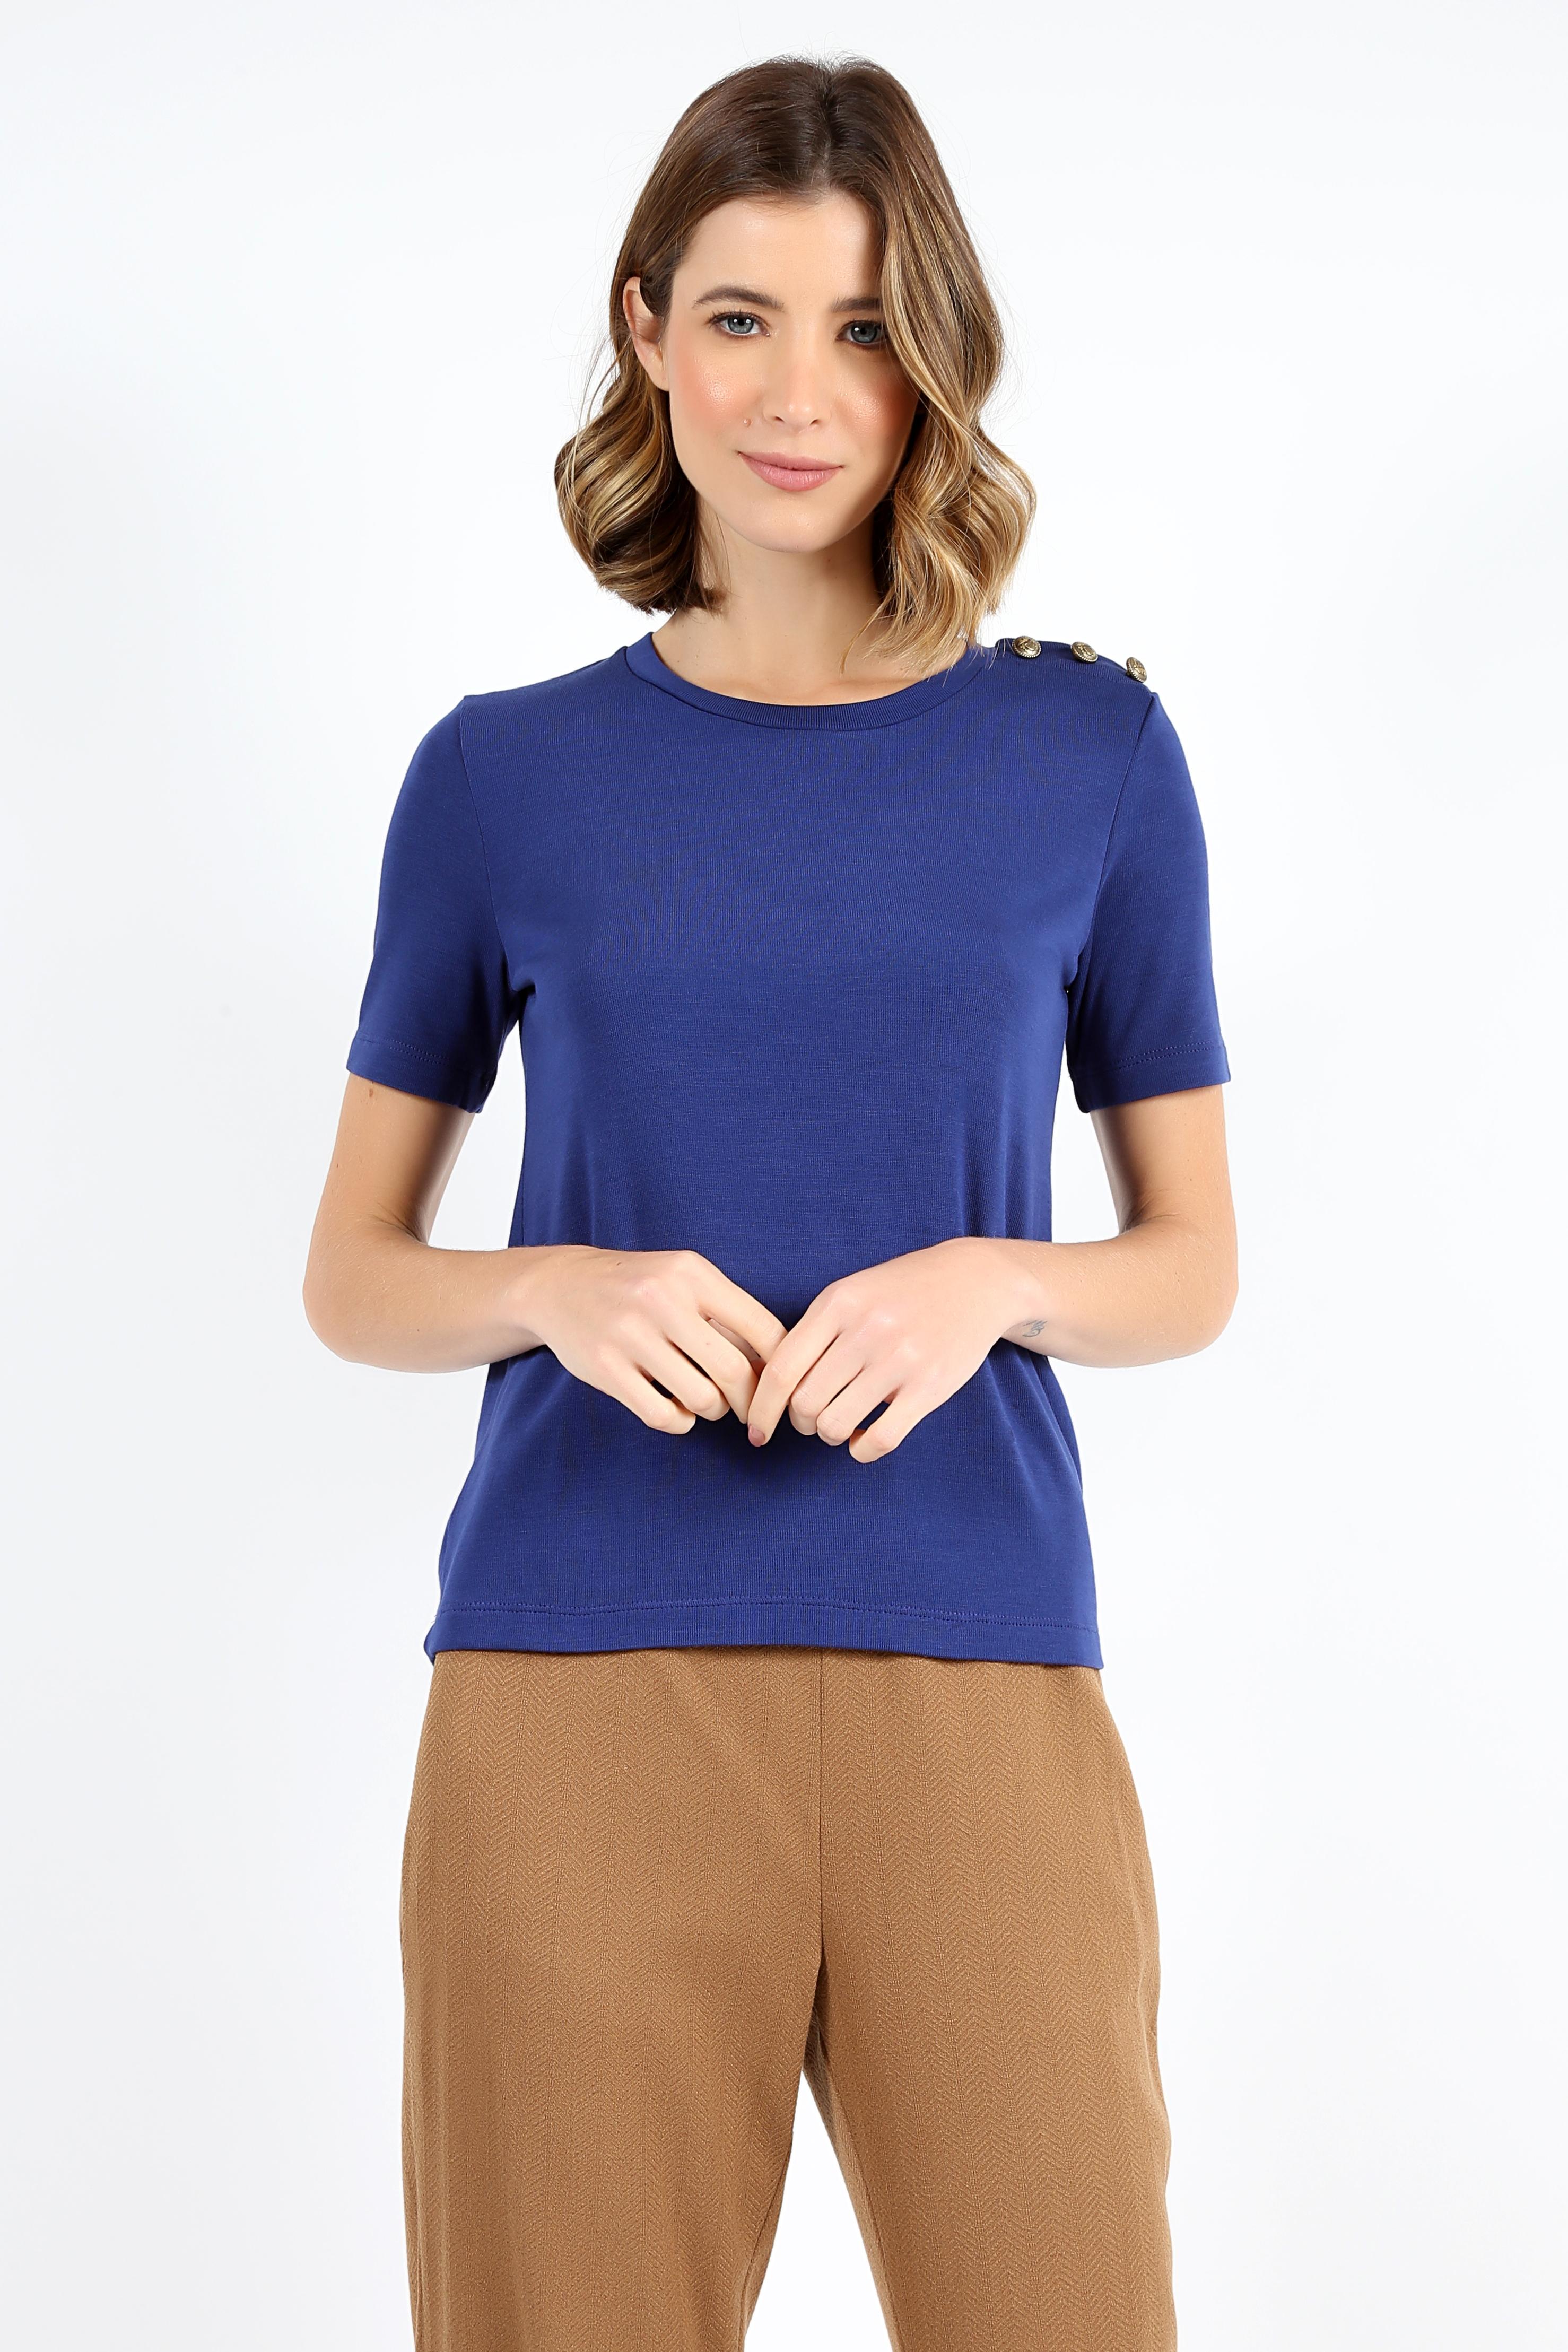 Camisa Tres Botoes Ombro Azul